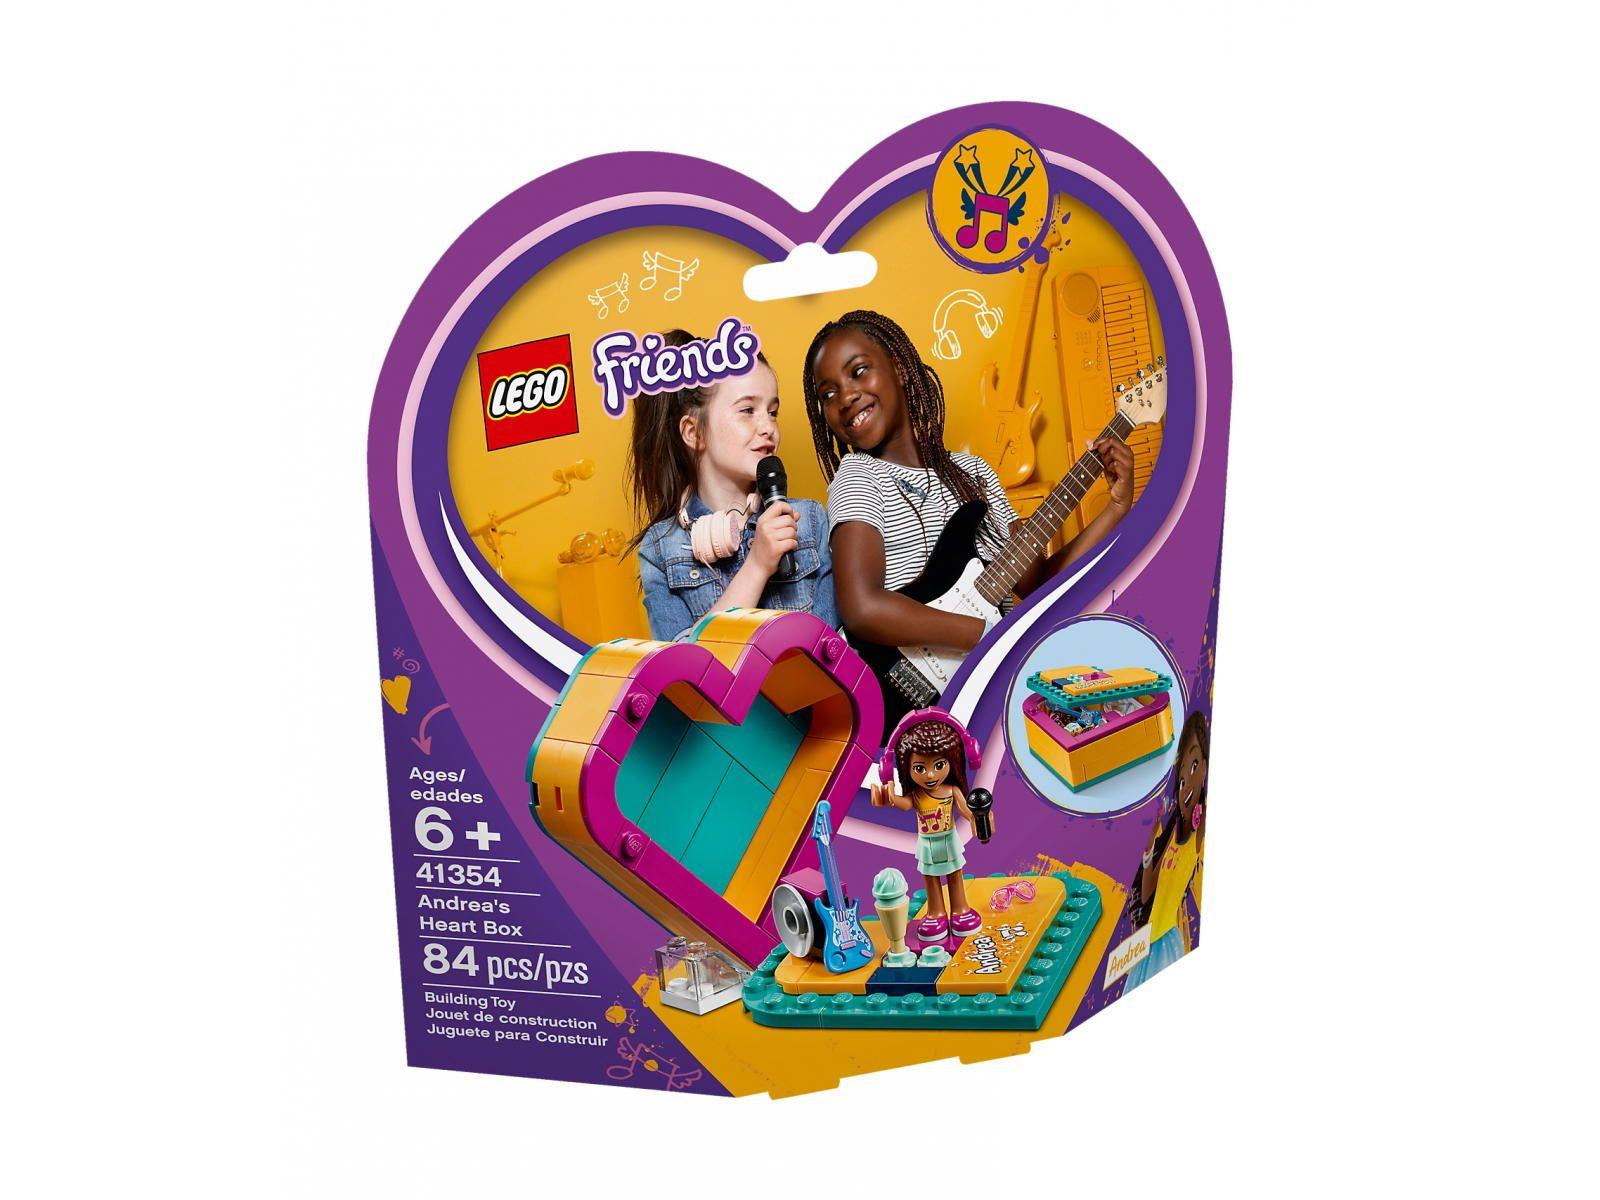 Lego 41354 Friends Pudelko W Ksztalcie Serca Andrei Porownaj Ceny Promoklocki Pl